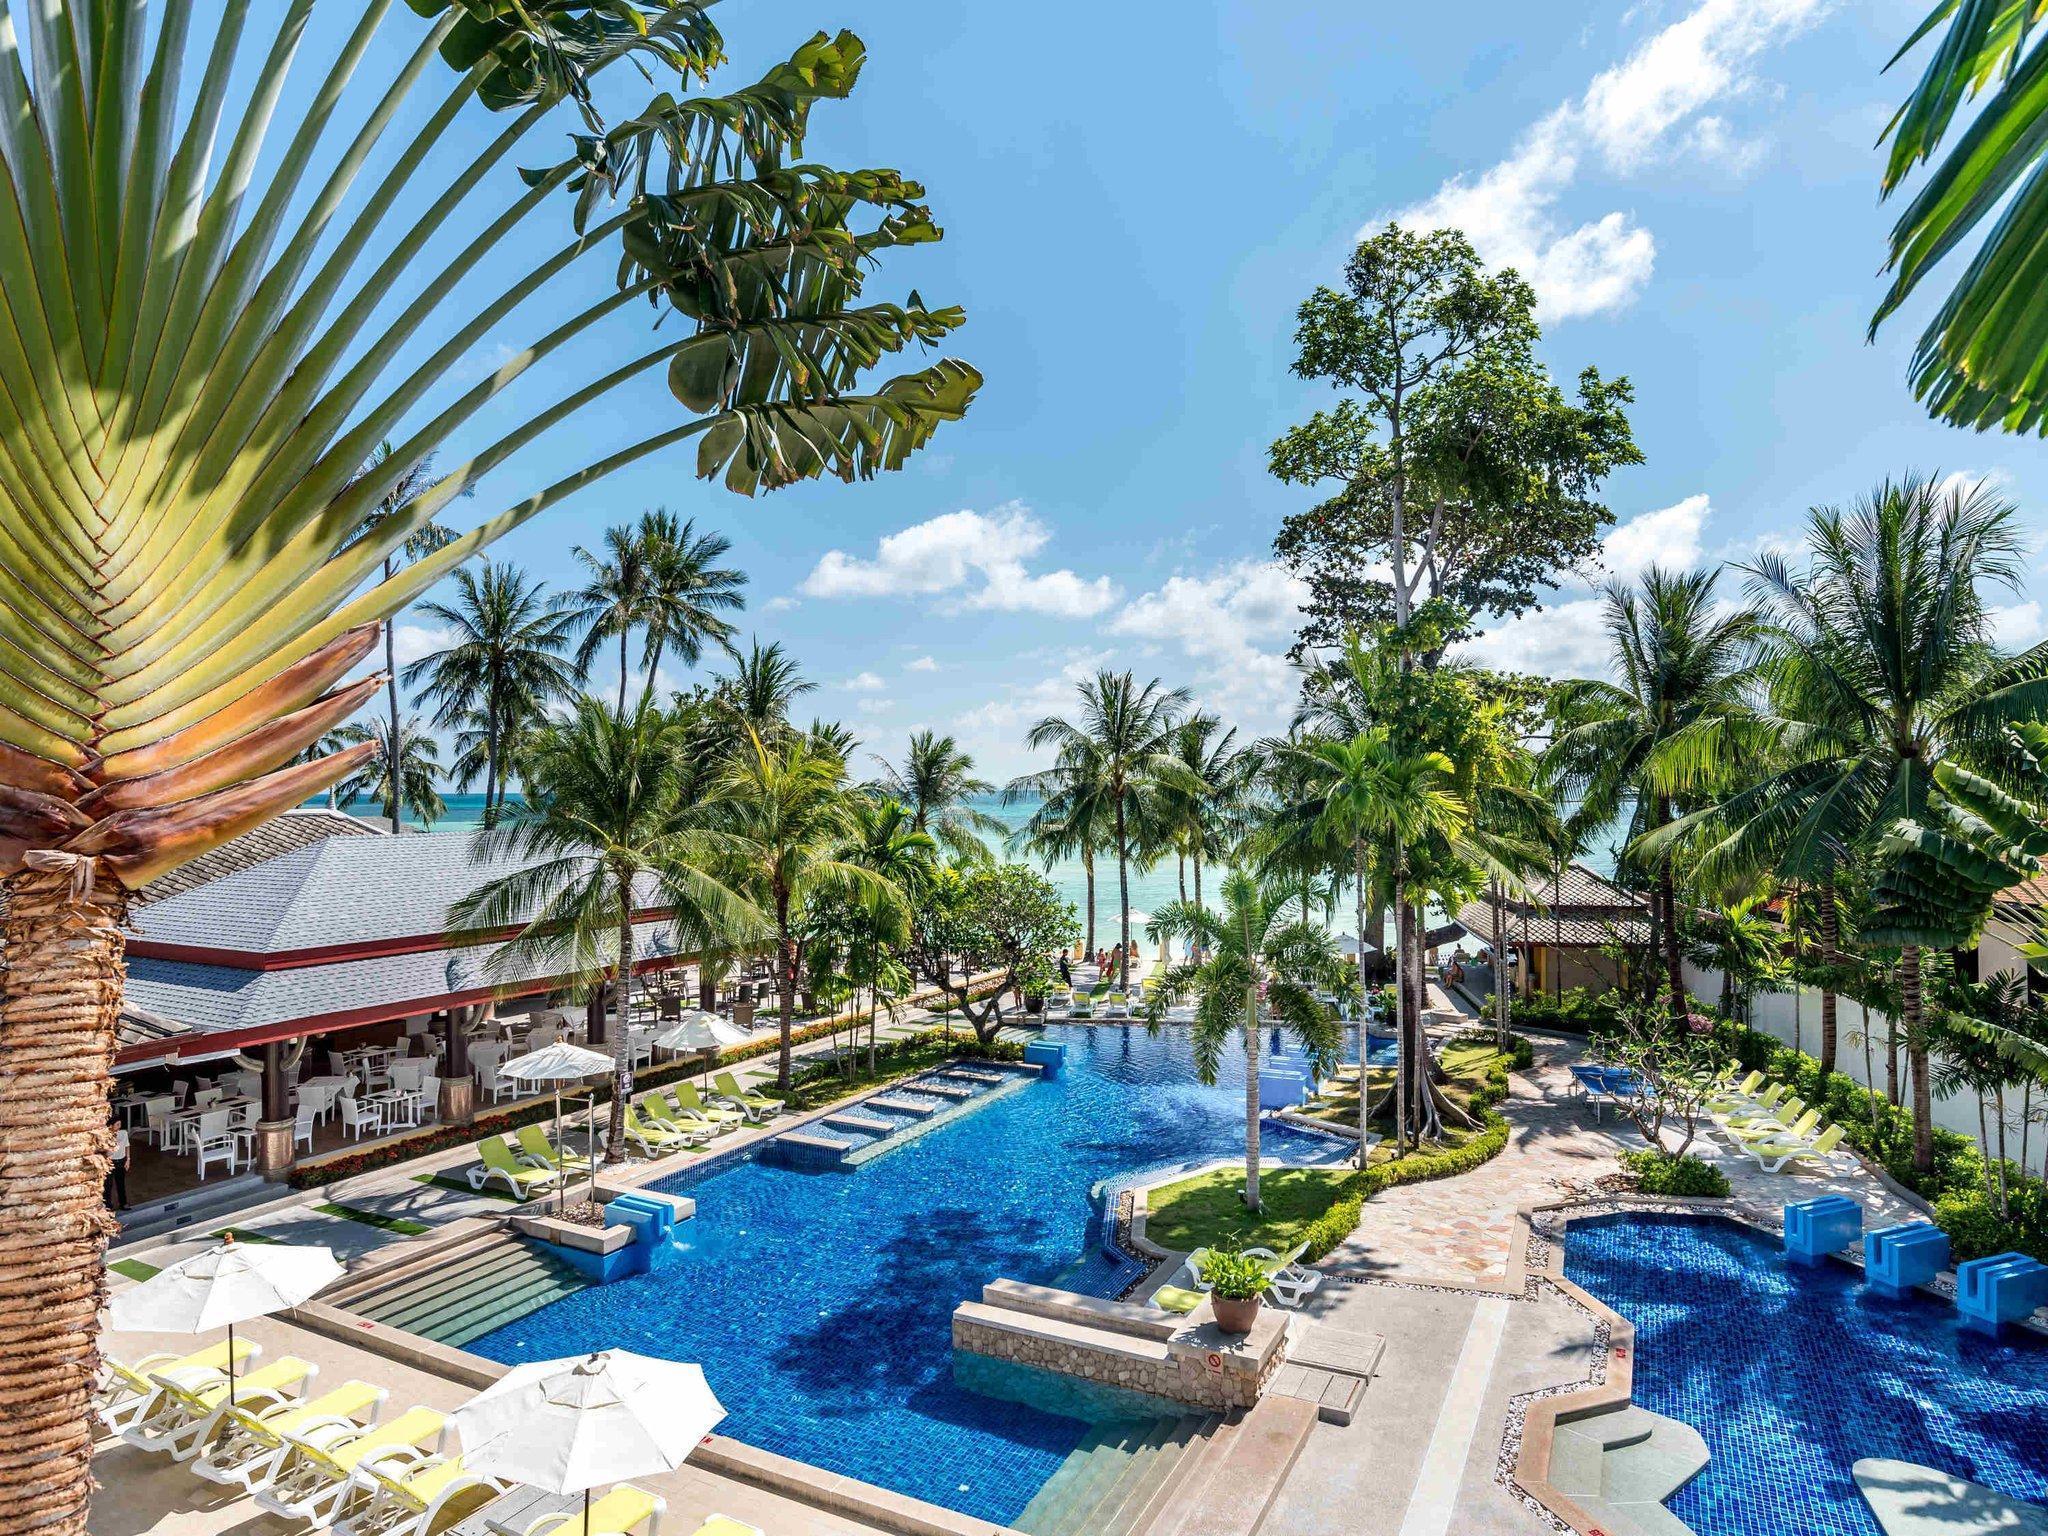 Novotel Samui Resort Chaweng Beach Kandaburi โนโวเทล สมุย รีสอร์ต เฉวง บีช กานดาบุรี